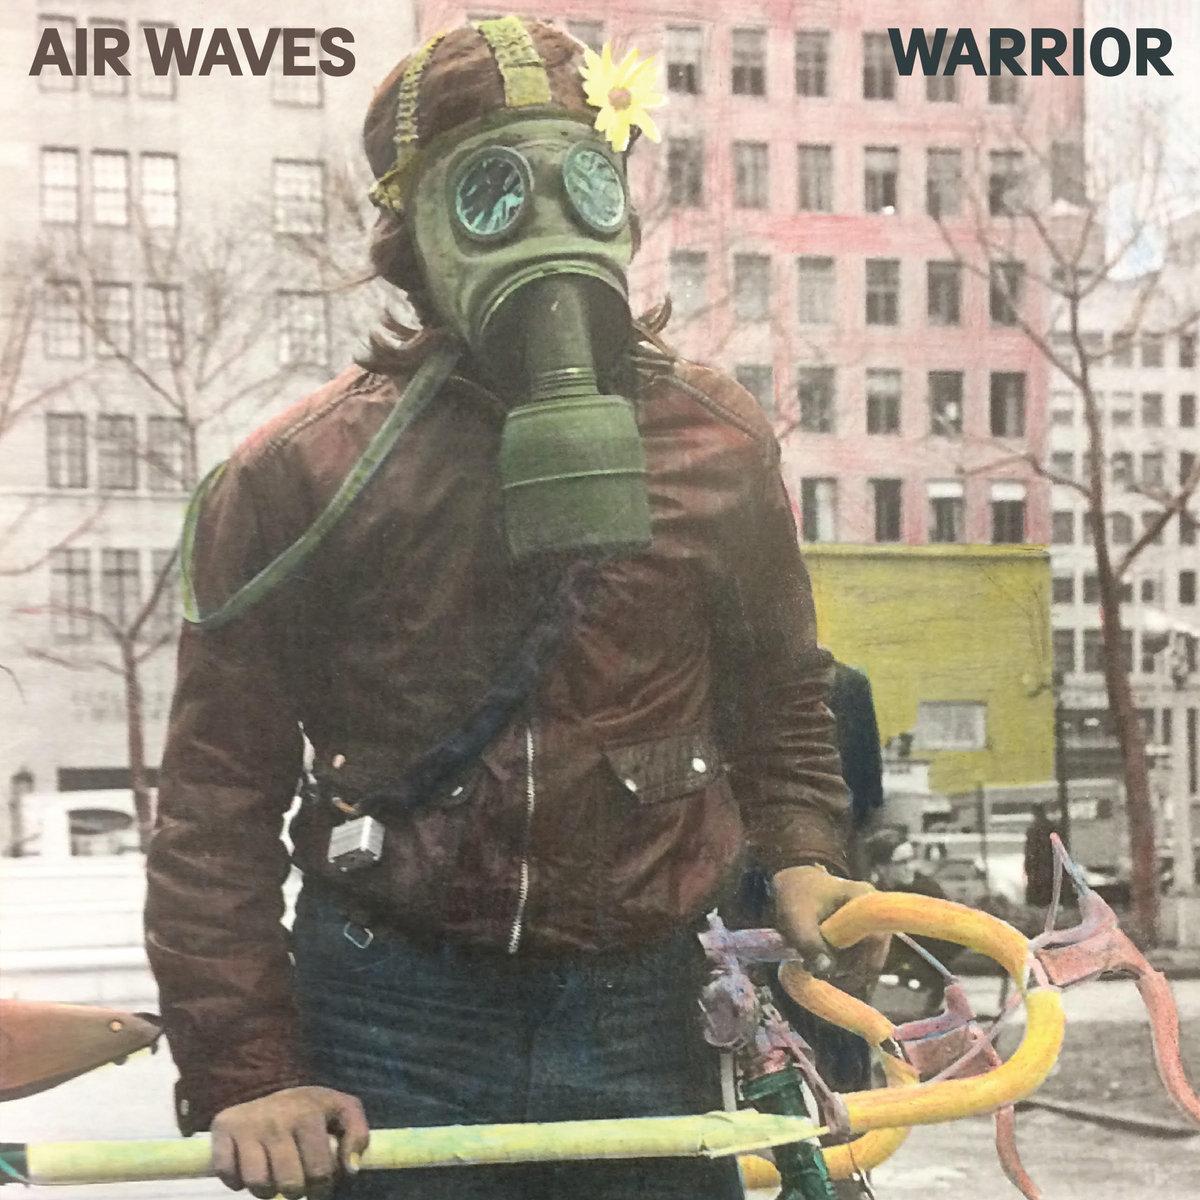 Warrior | Air Waves